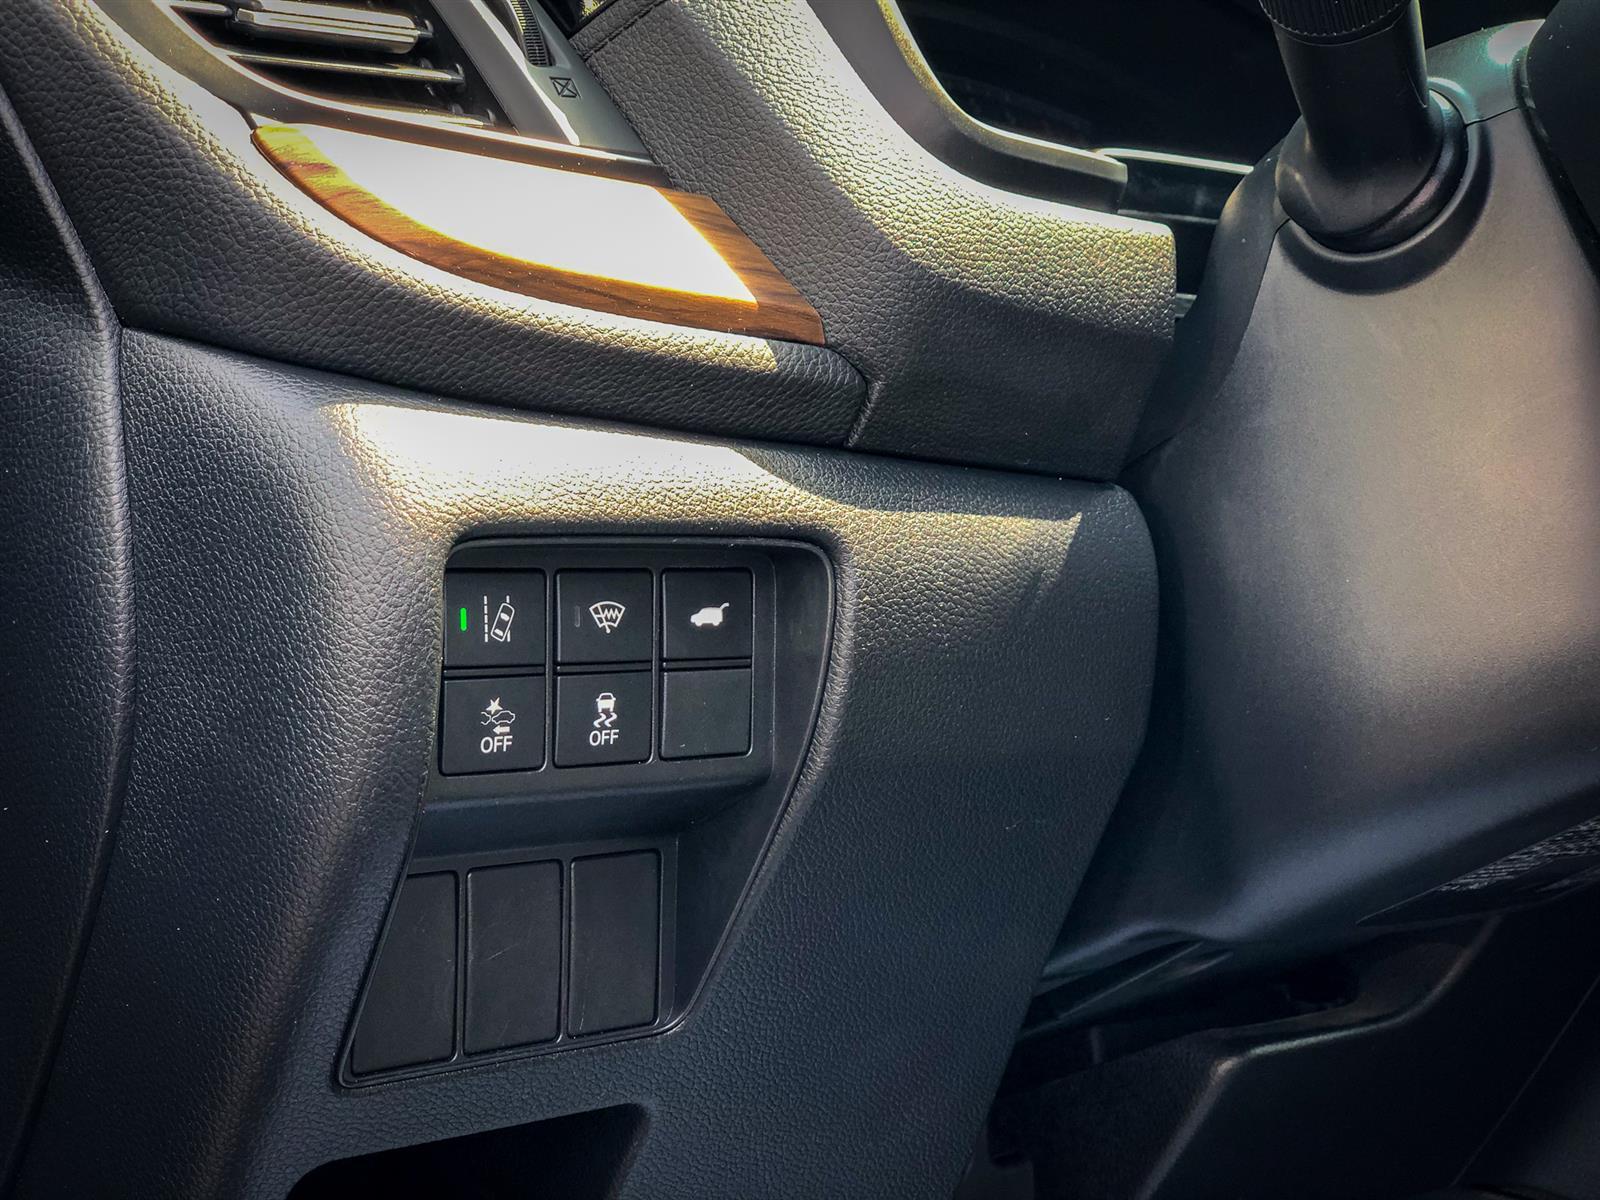 2017 Honda CR-V TOURING | 1.5L I-4 TURBO | AWD | LANE KEEP | REAR CAMERA